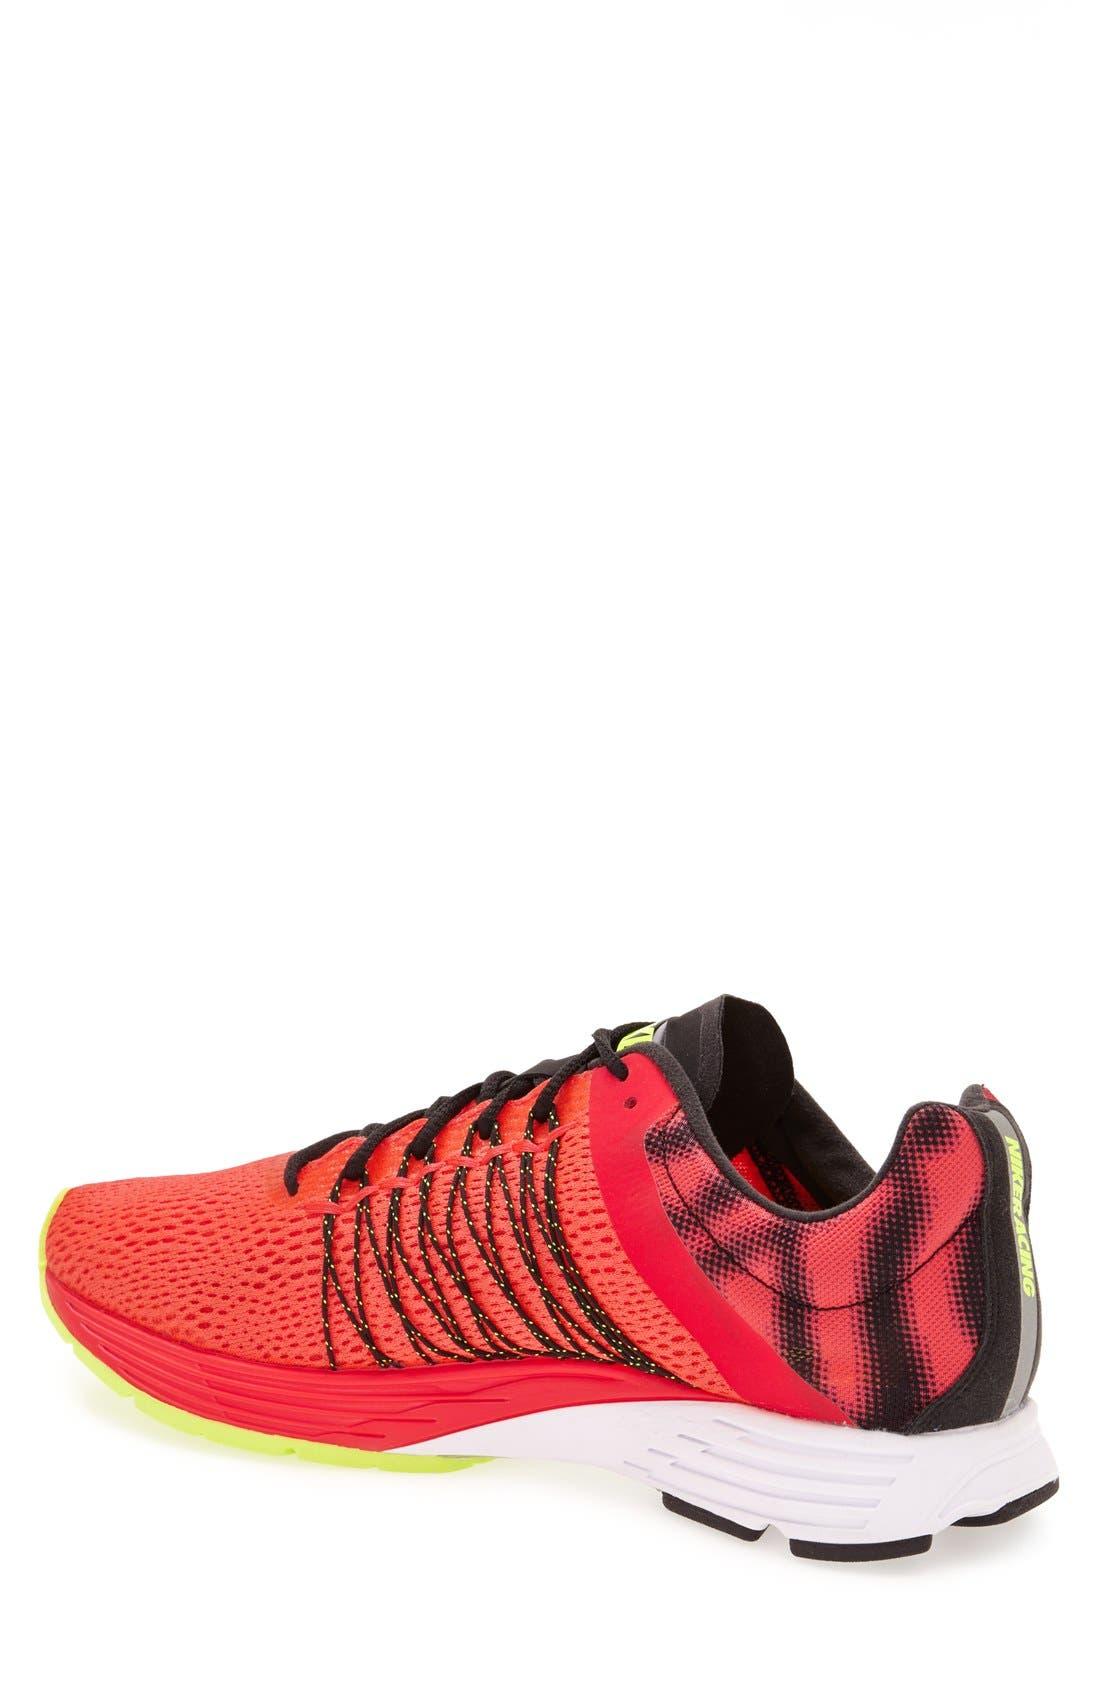 Alternate Image 2  - Nike 'Zoom Streak 5' Running Shoe (Men)